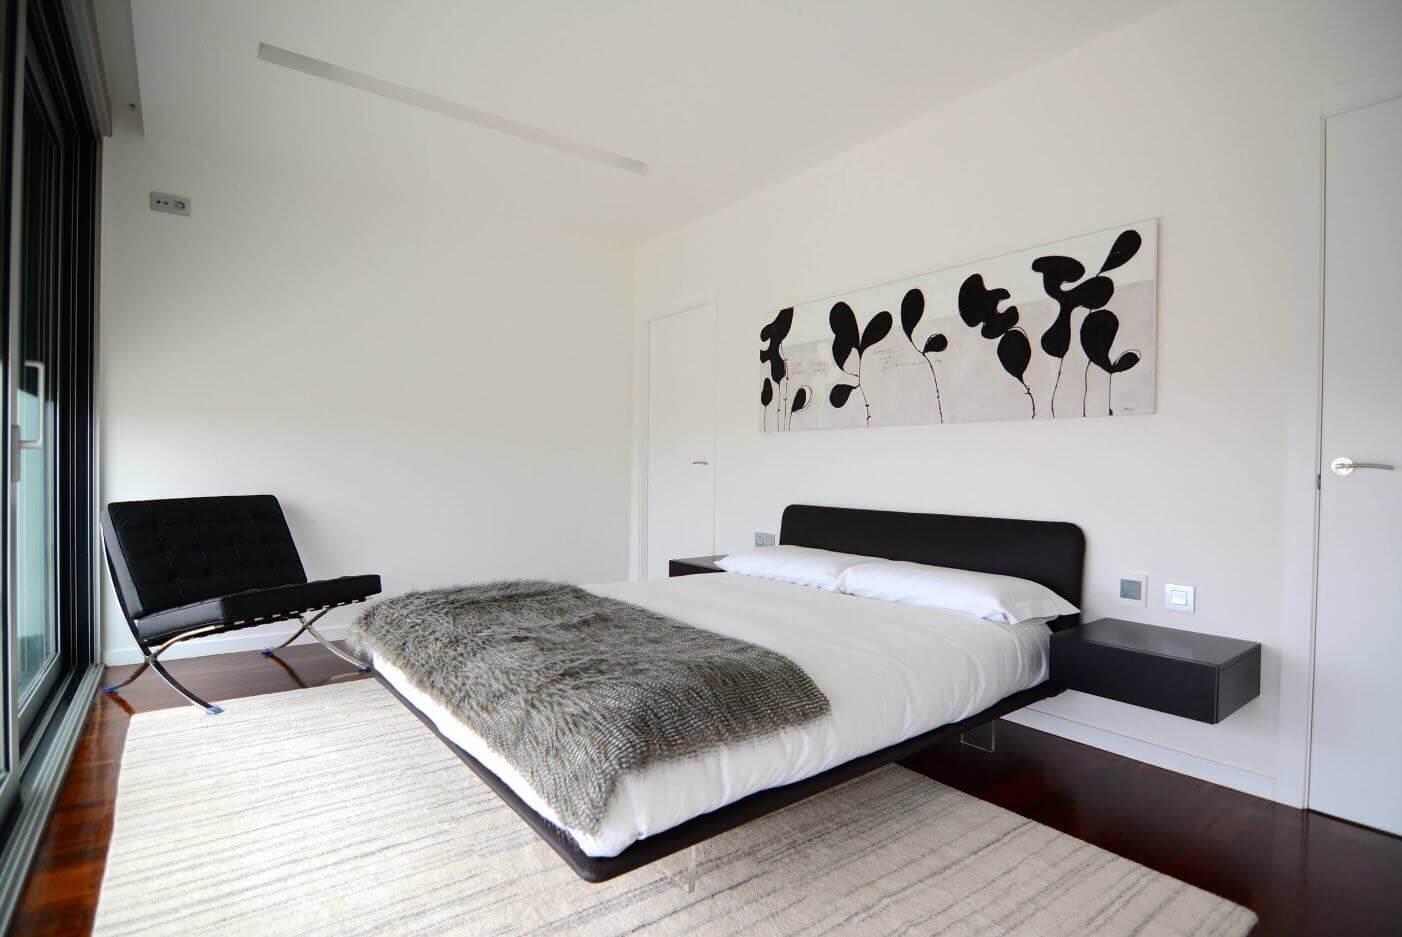 Спальня в стиле хай-тек - отделка стен (3)